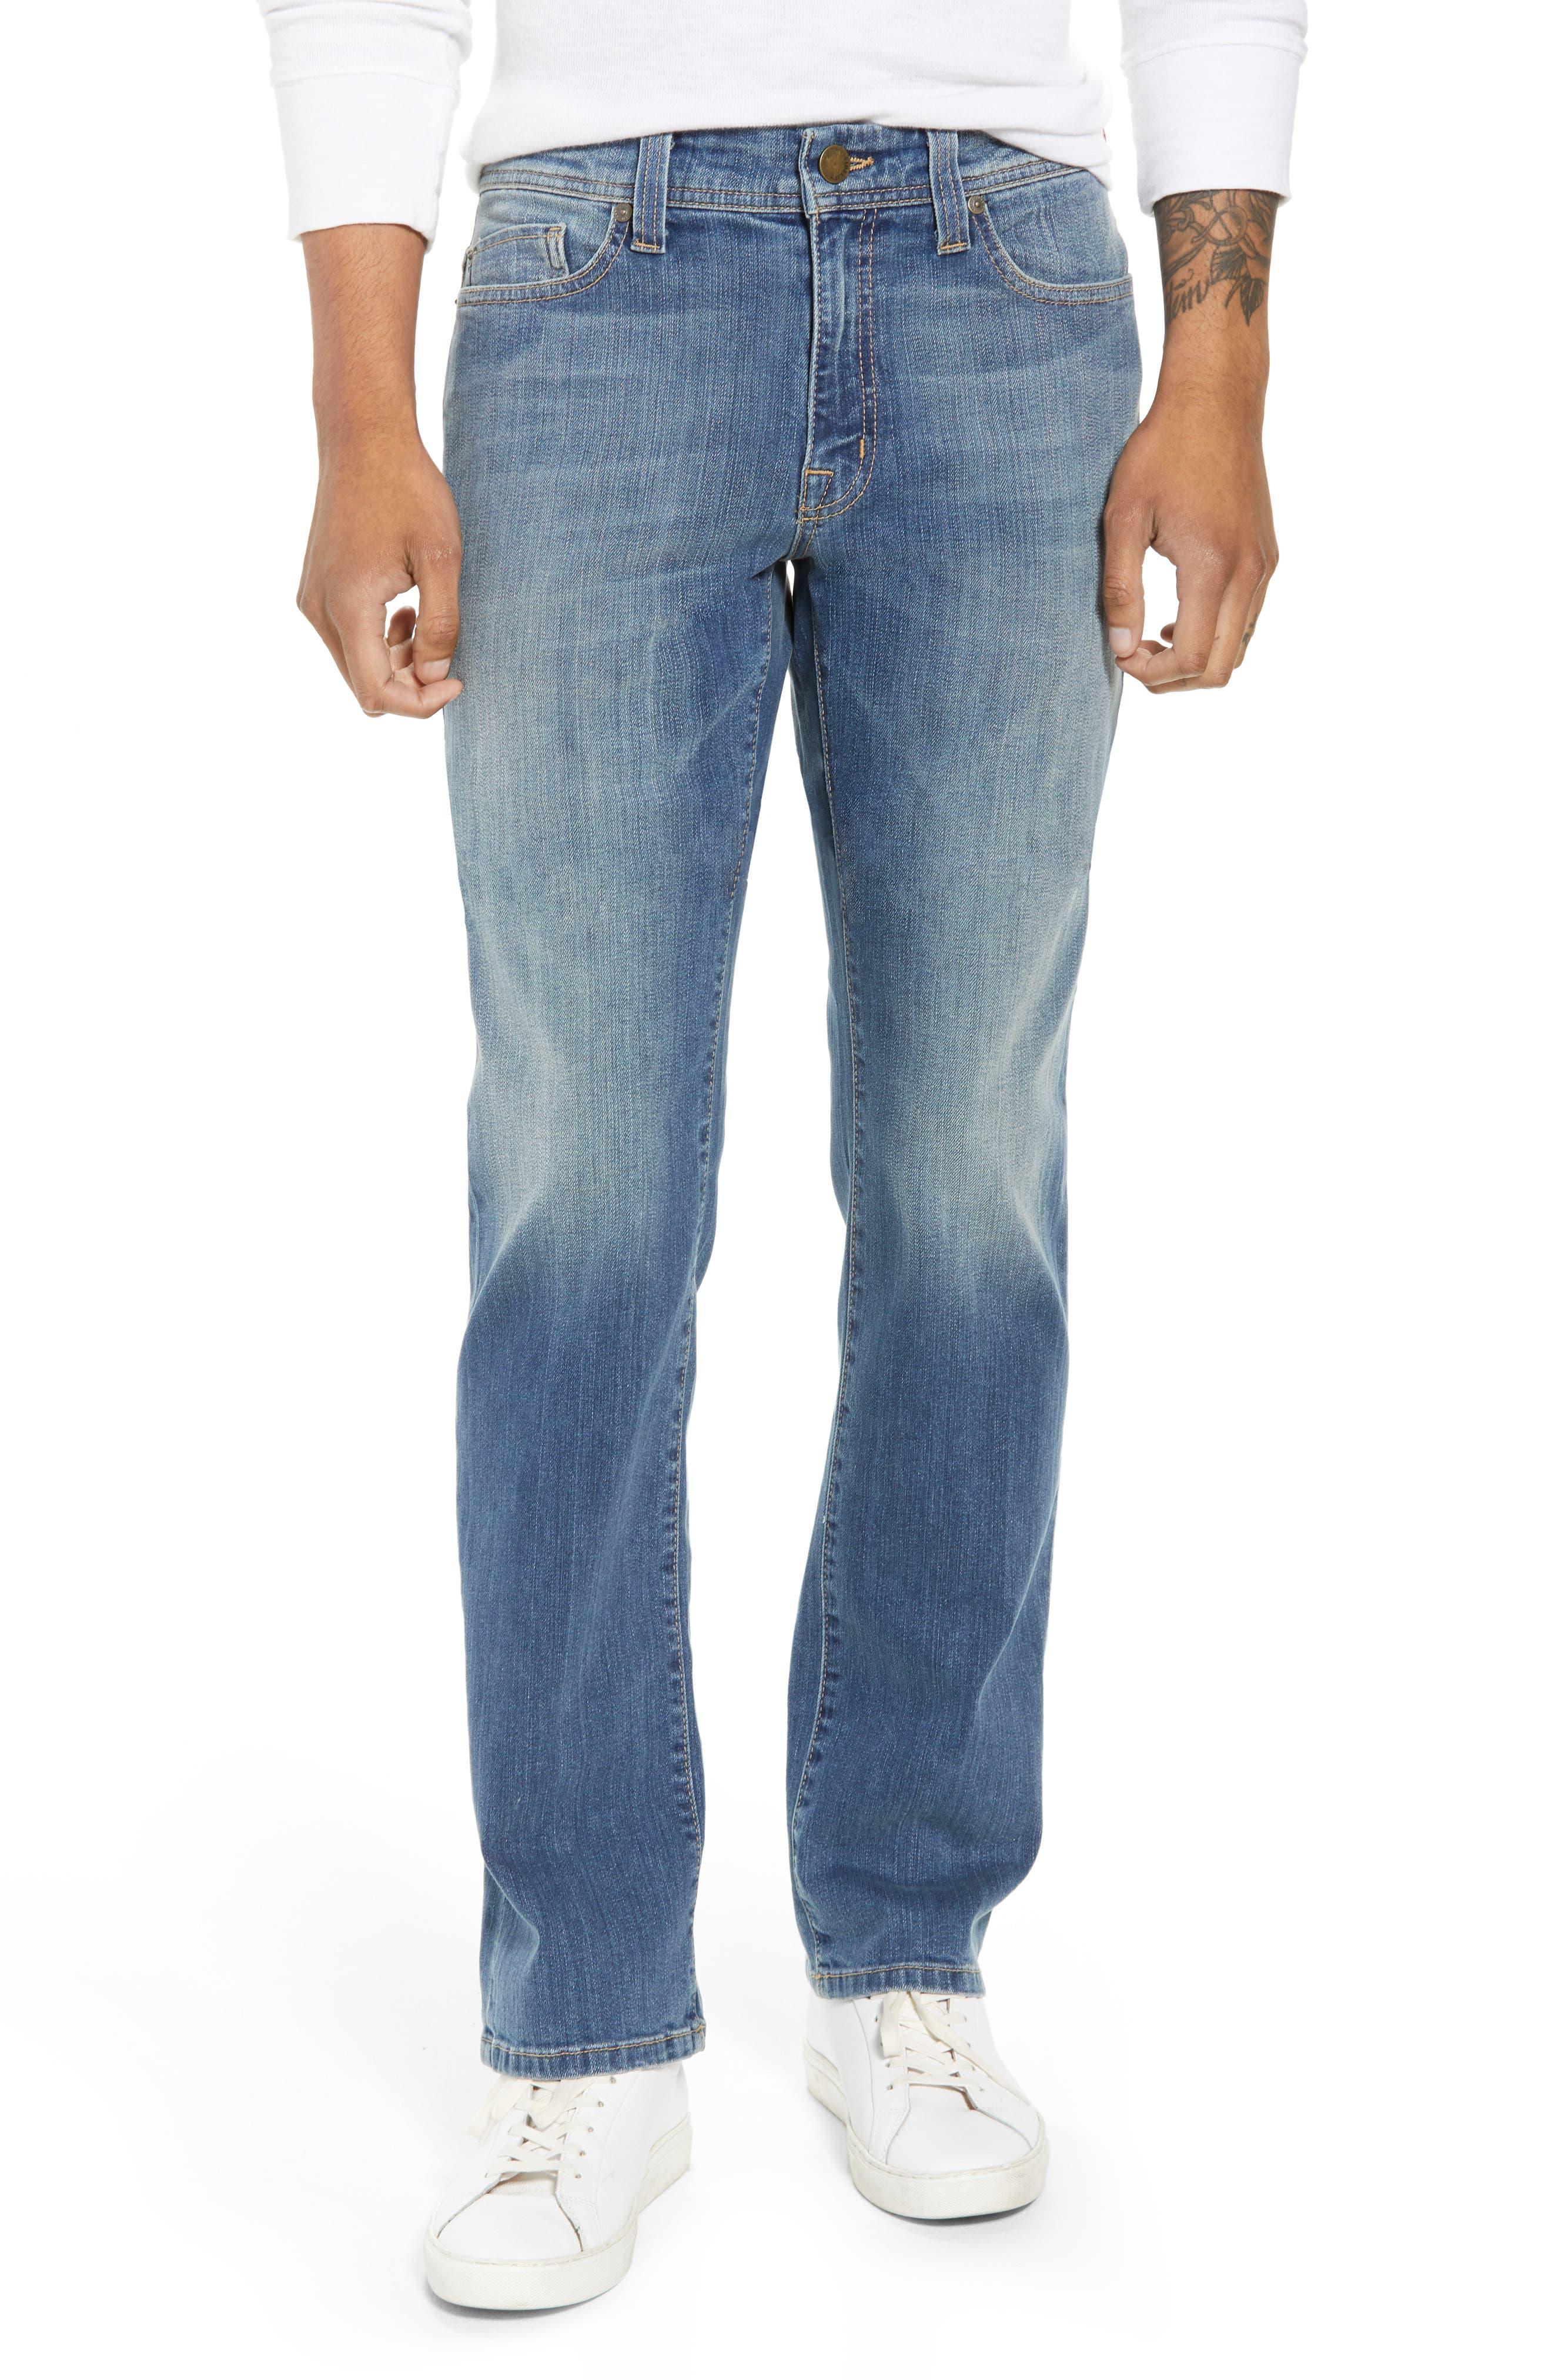 Jimmy Slim Straight Leg Jeans,                             Main thumbnail 1, color,                             SYNDICATE BLUE